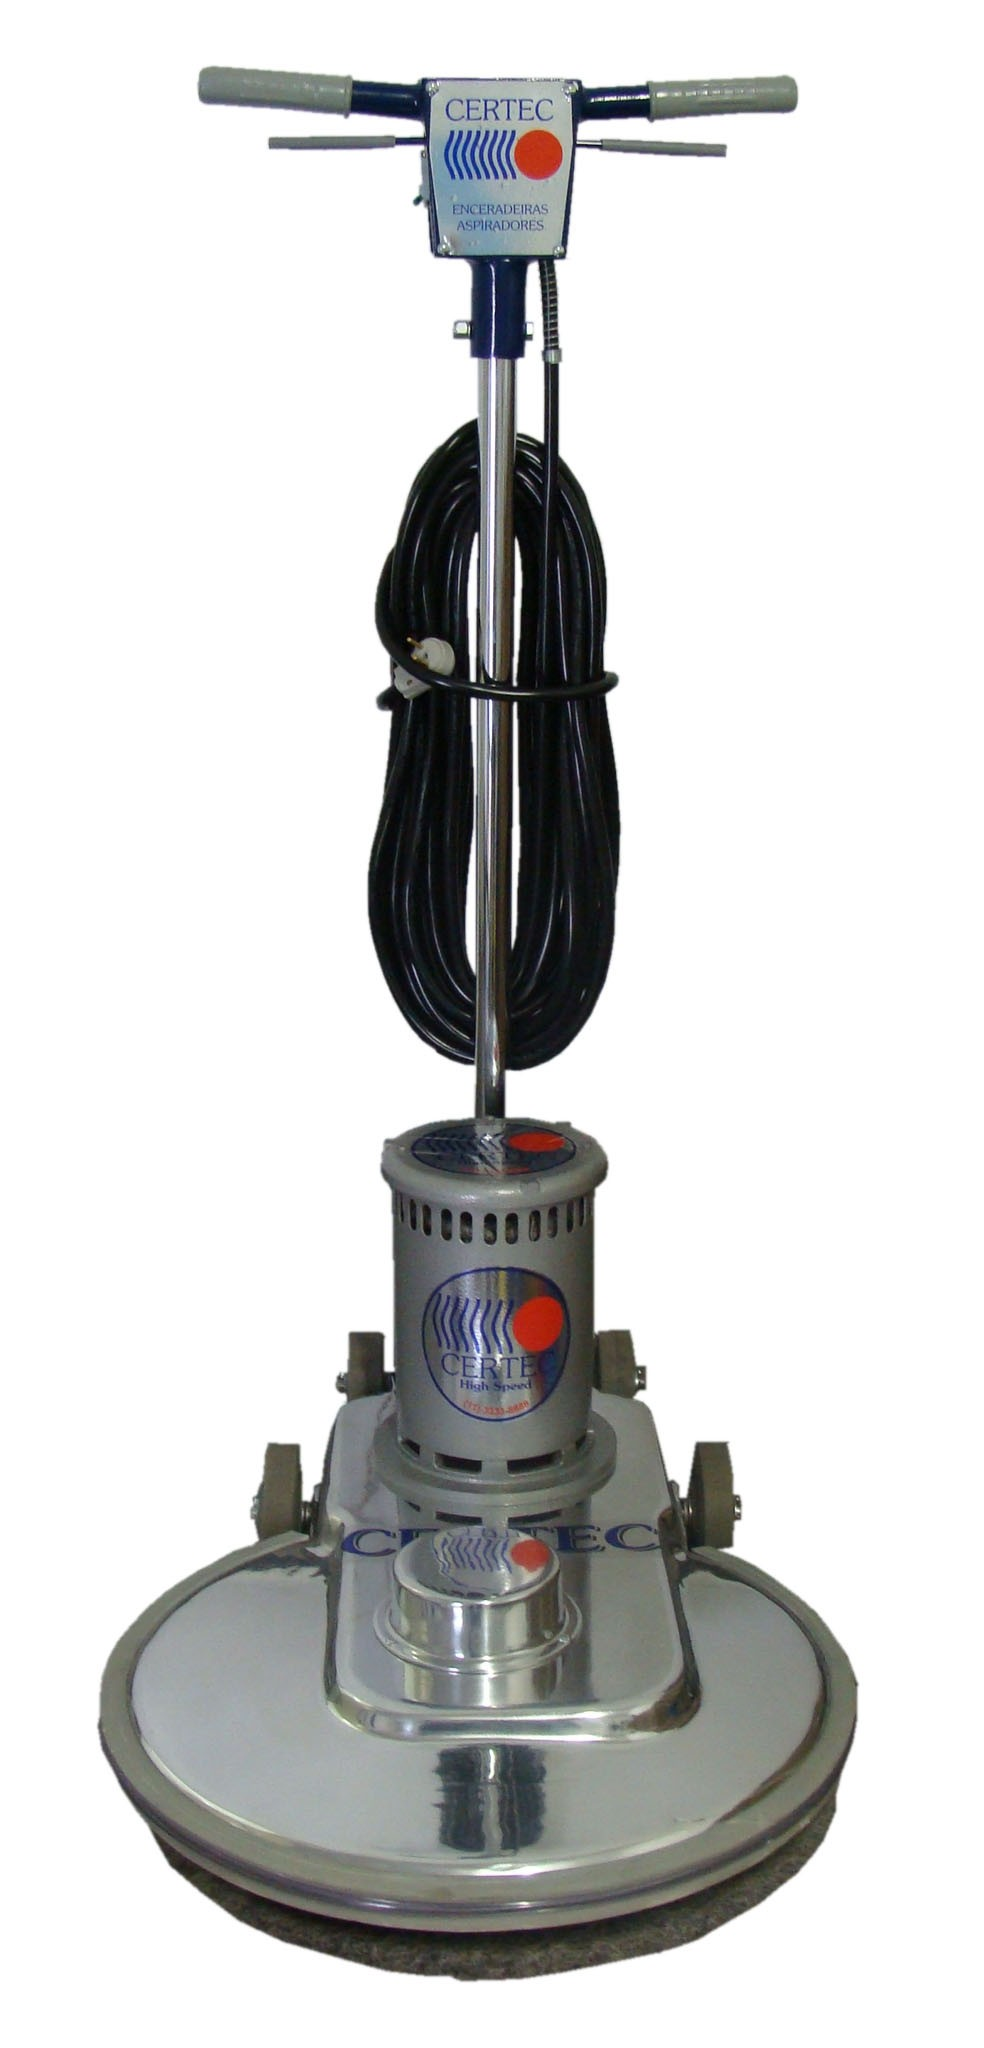 POLIDORA UHS HIGH SPEED 220V 2400 RPM CERTEC